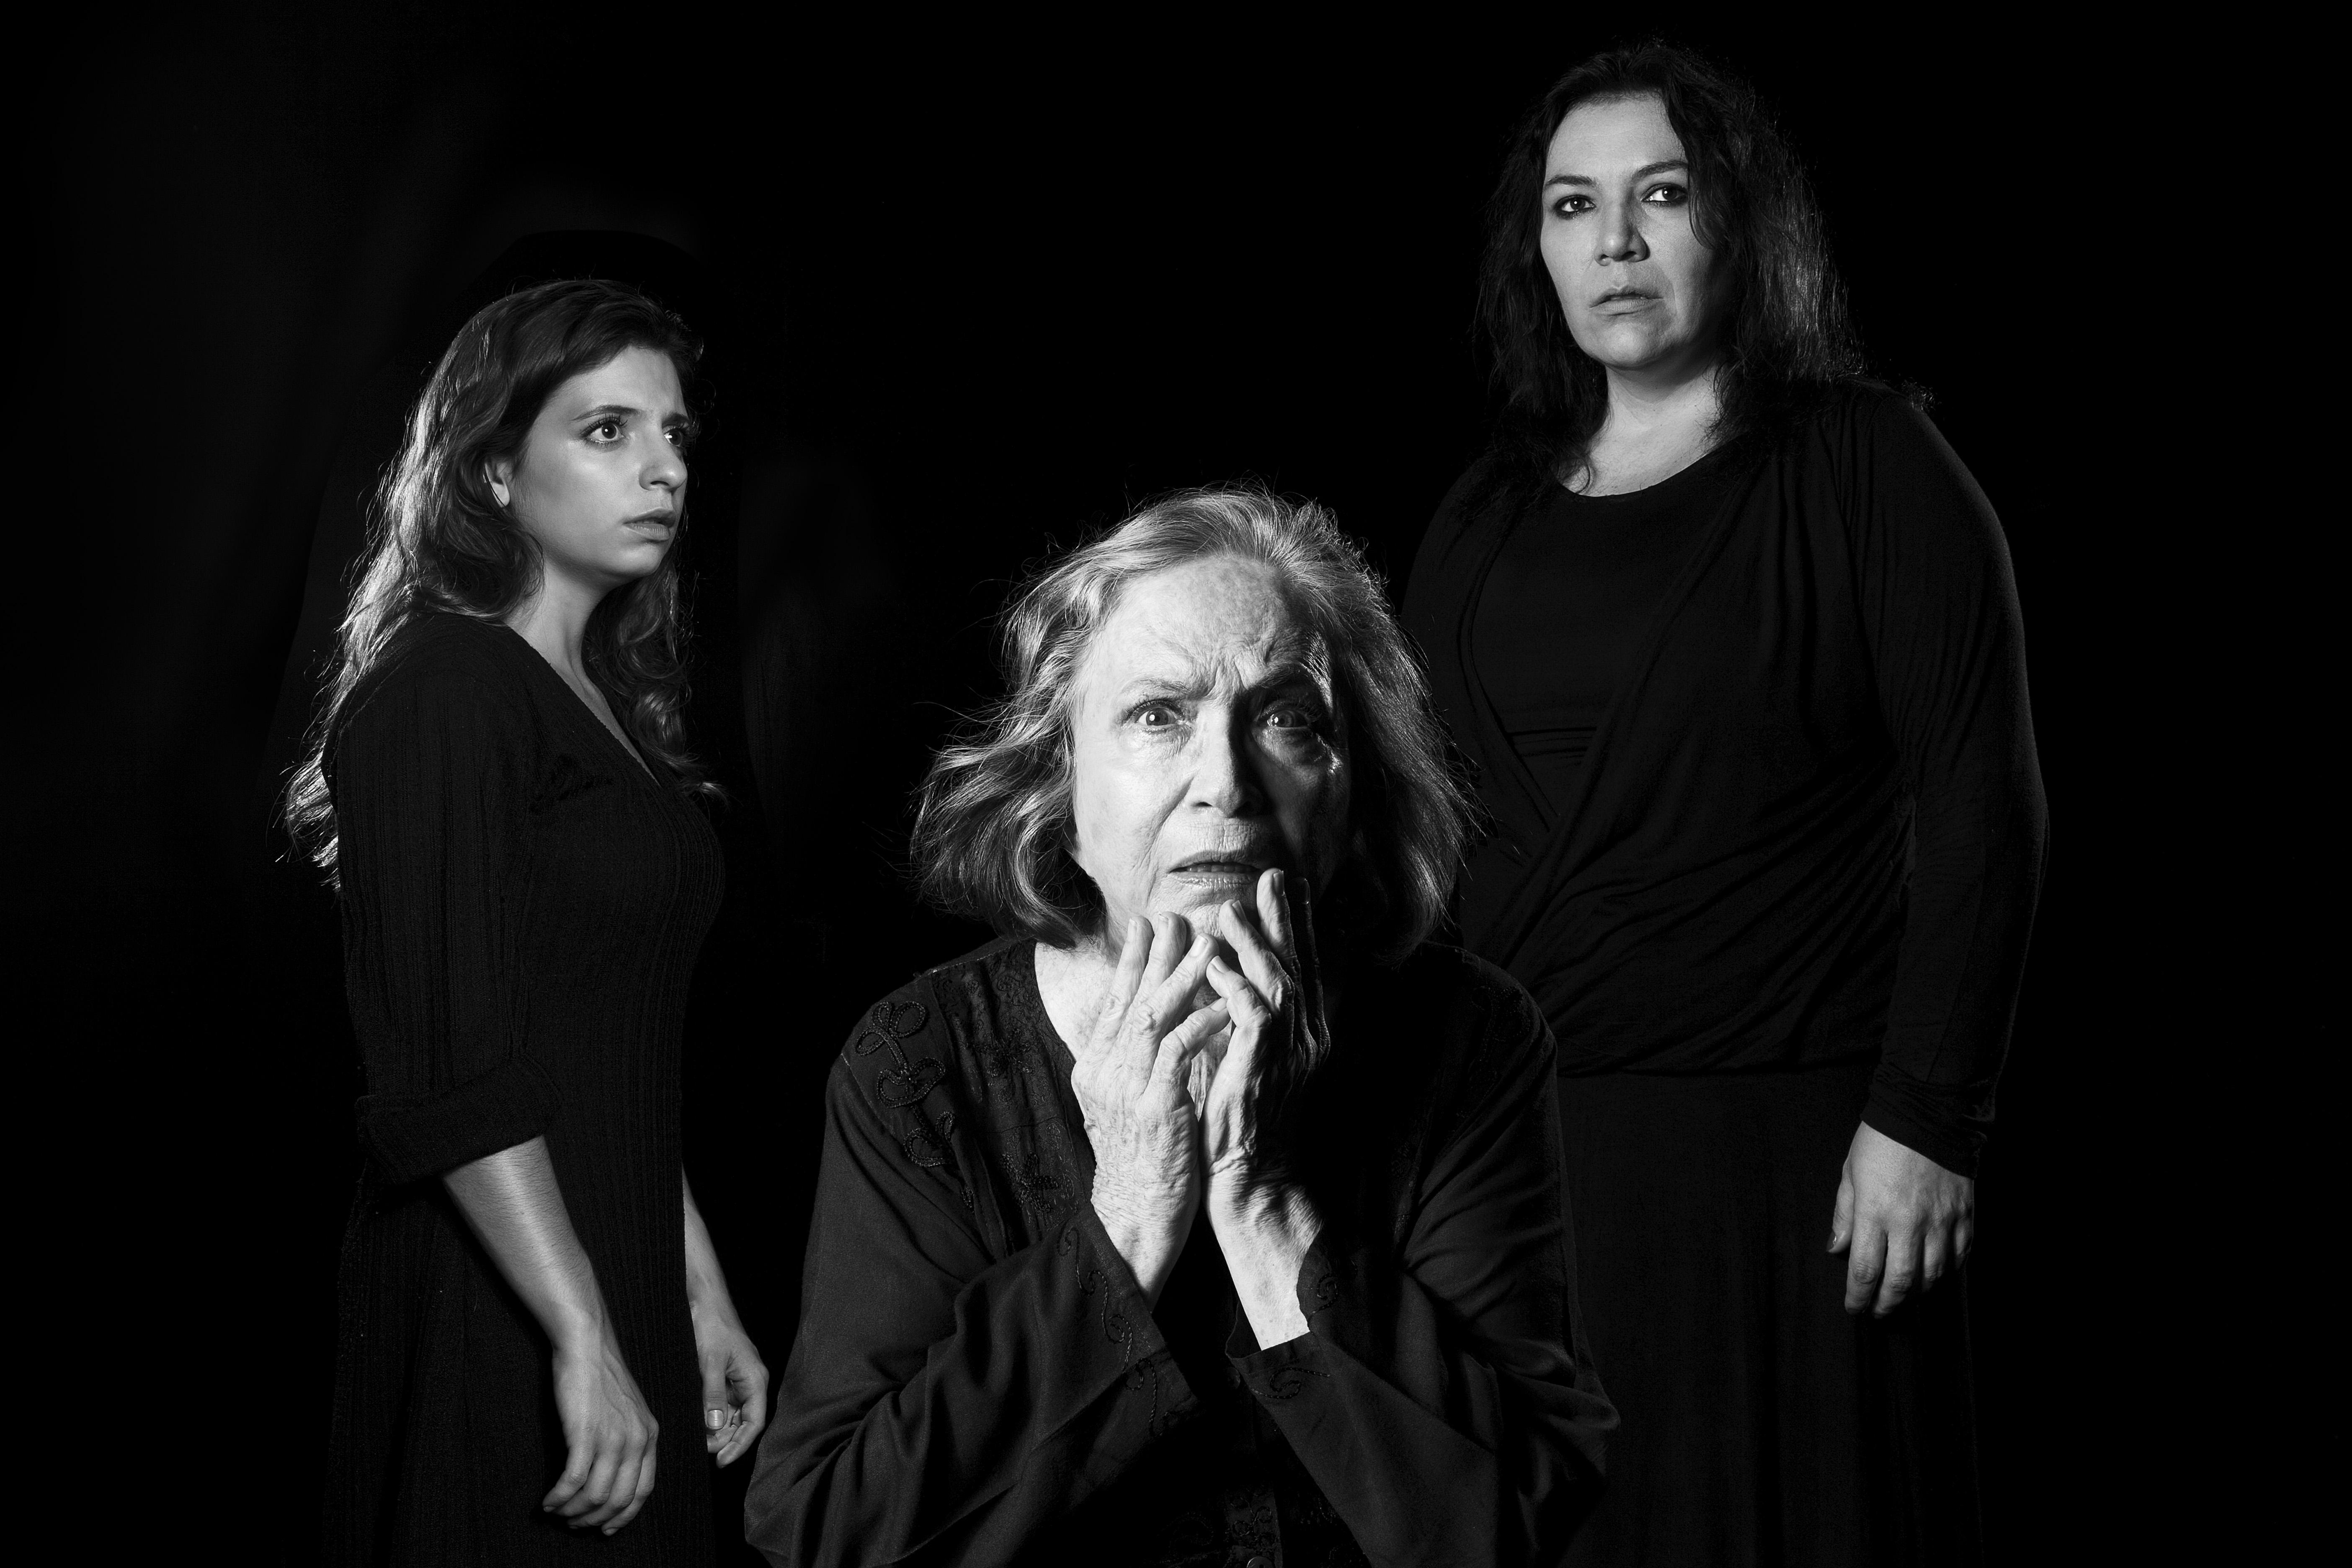 Paula Spinelli, Nathalia Timberg e Juliana Galdino em Tríptico Samuel Beckett (Foto: Daniel Seabra)